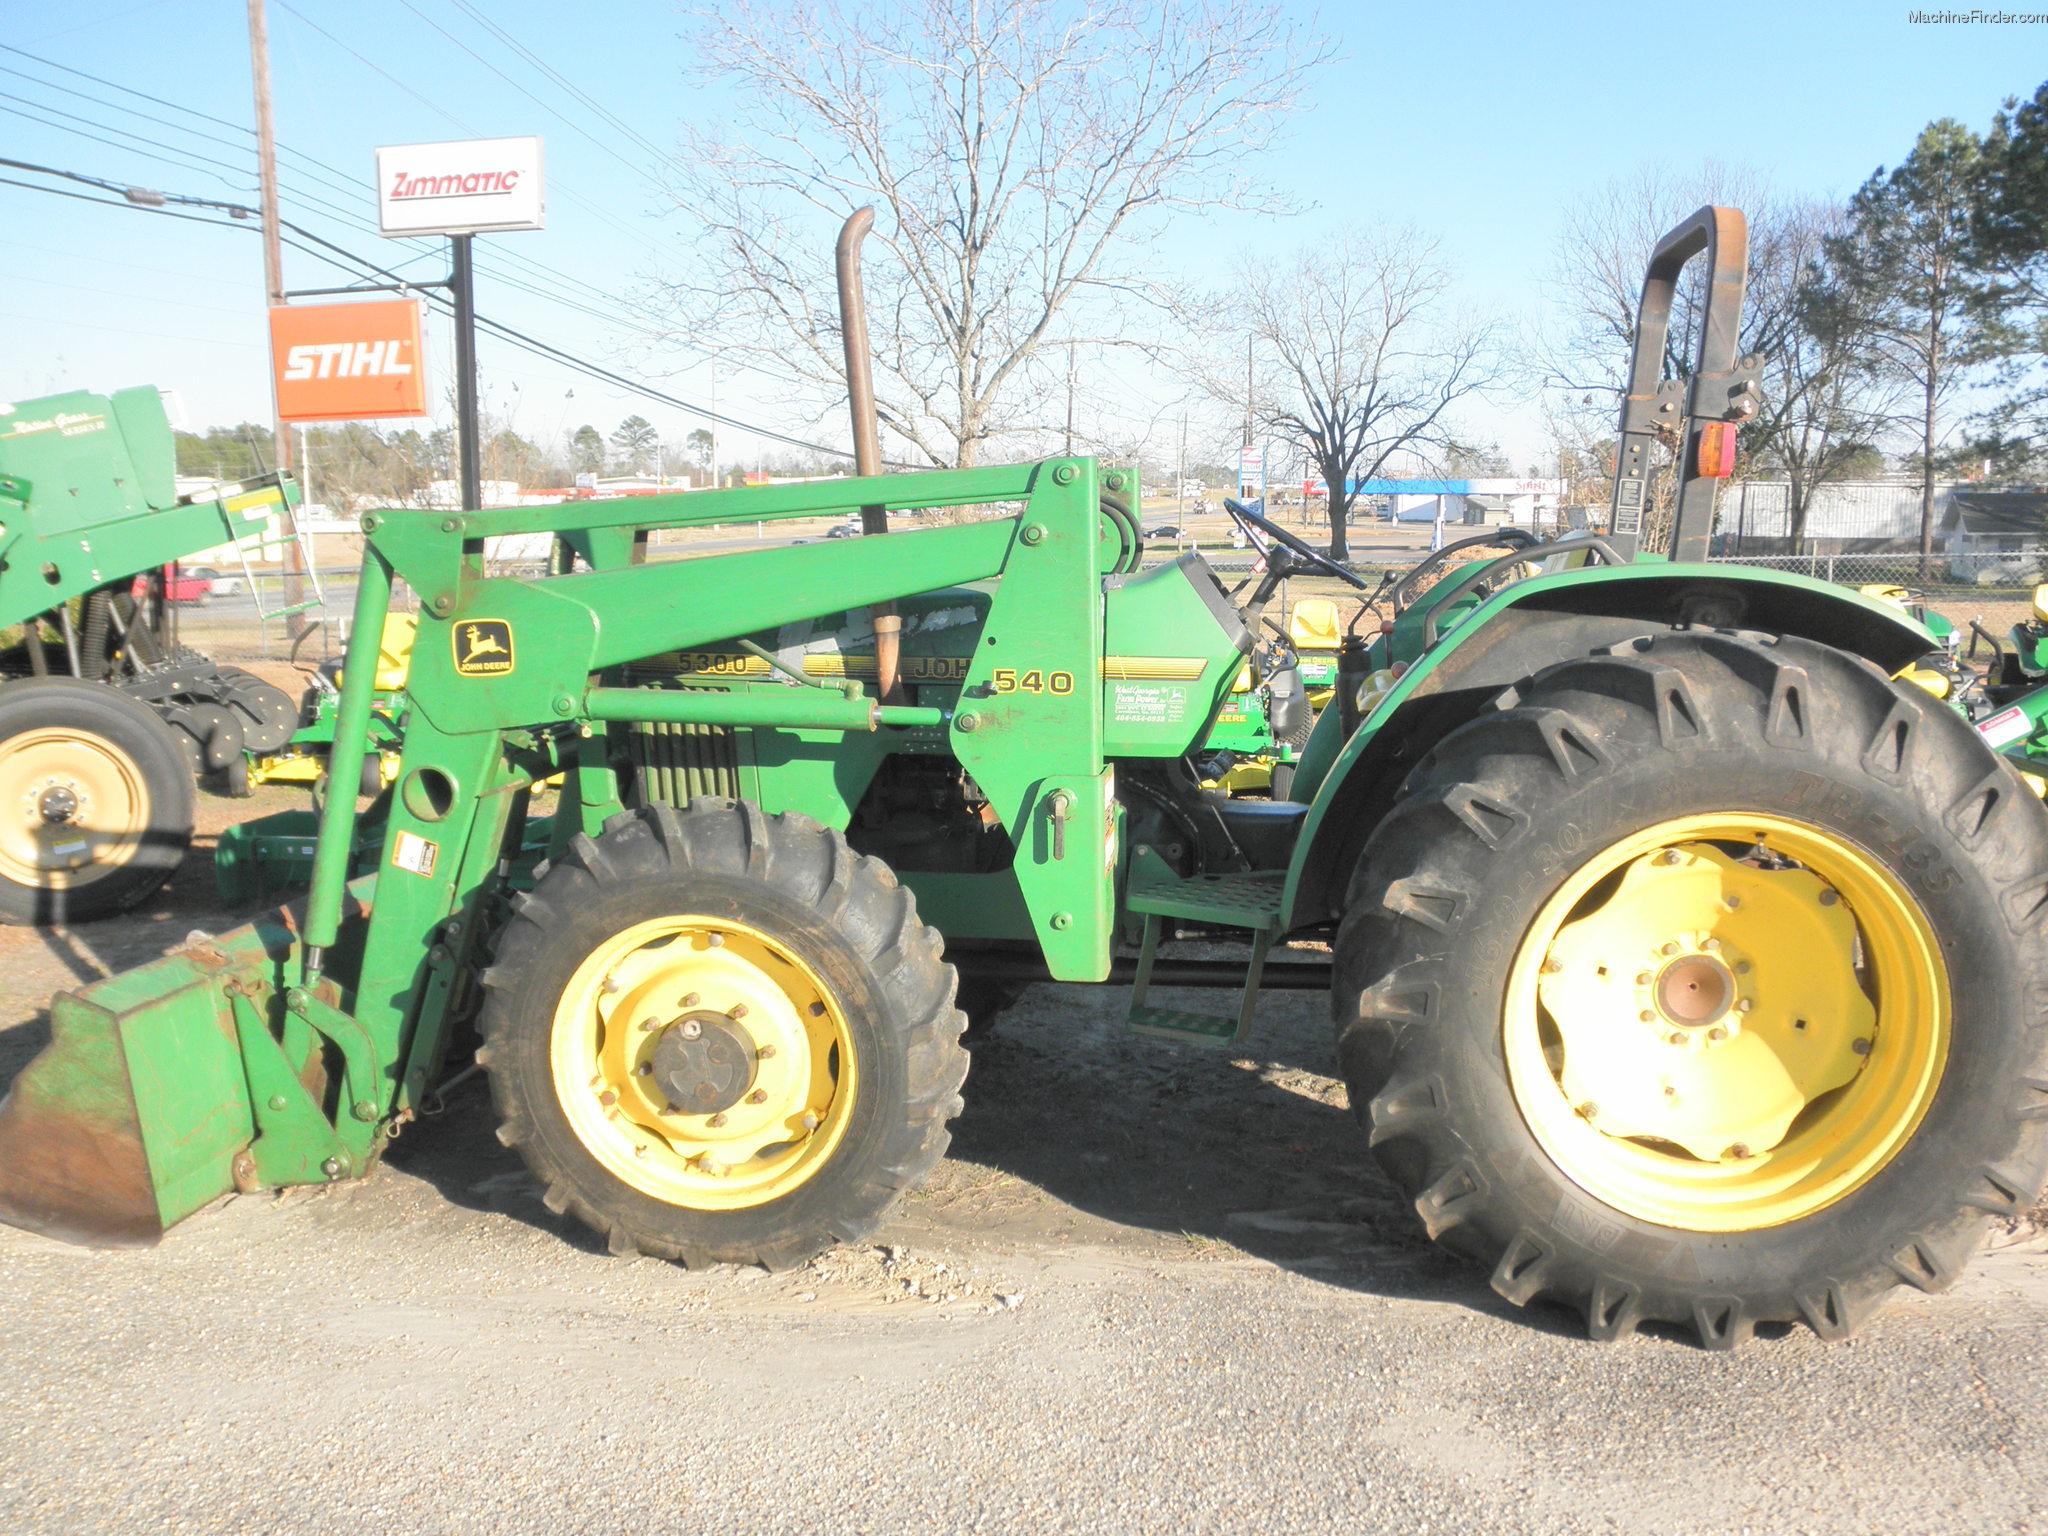 1995 John Deere 5300 Tractors - Compact (1-40hp.) - John ...